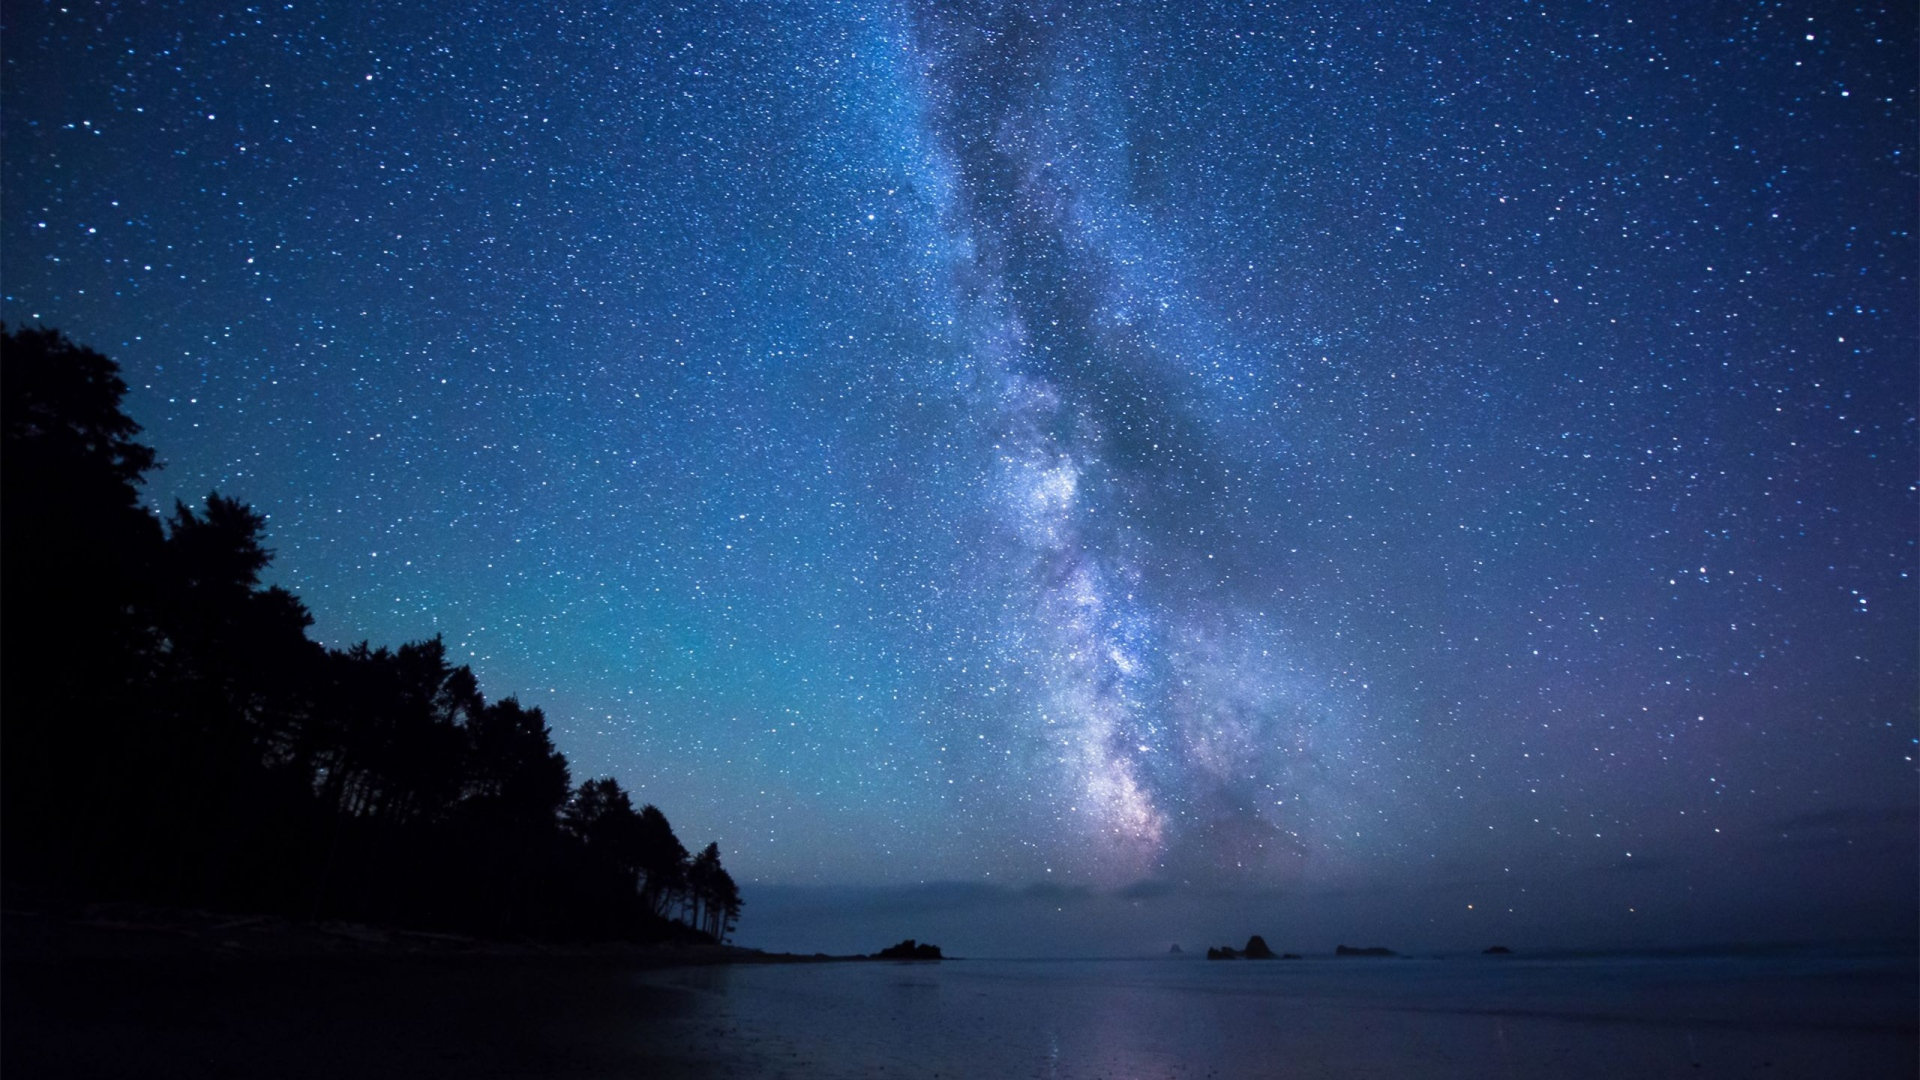 stars sky natural image